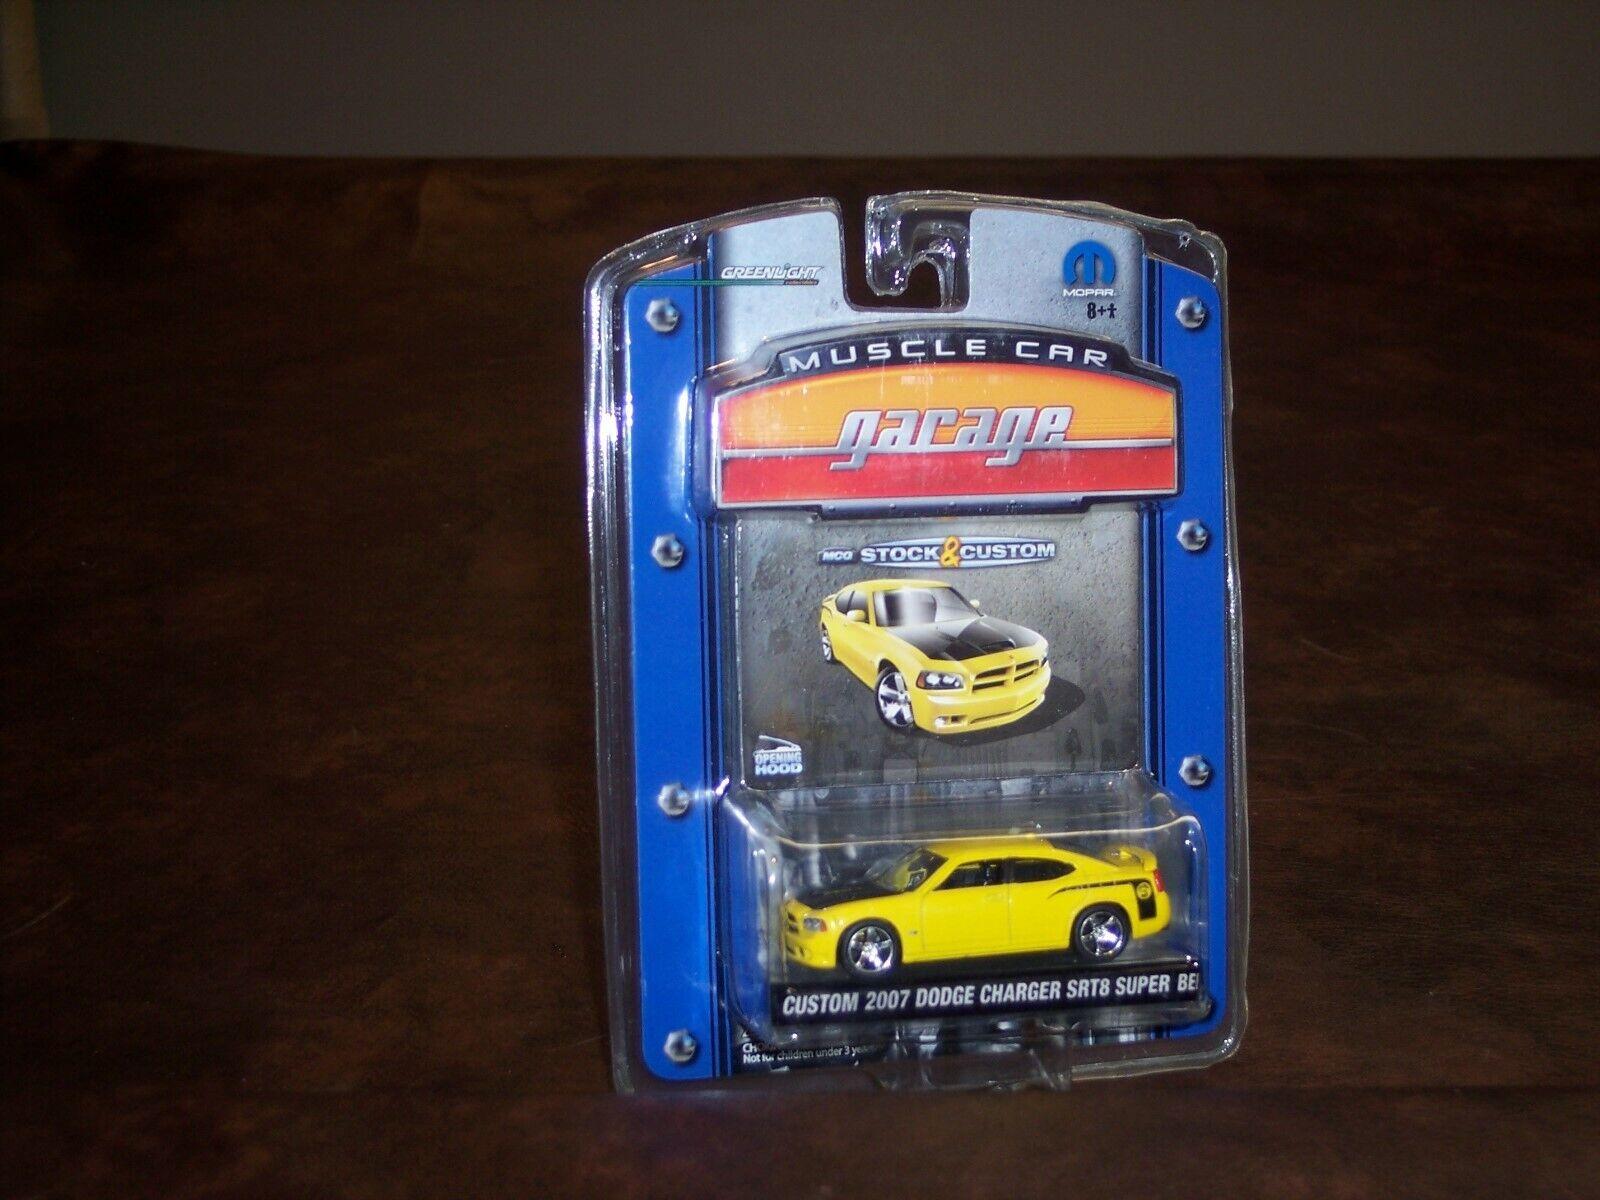 autentico en linea verdelight - 2006 Dodge Cochegador SRT8 súper Bee-Yelllow-como Bee-Yelllow-como Bee-Yelllow-como Nuevo A CASI NUEVO-Nuevo  Venta barata